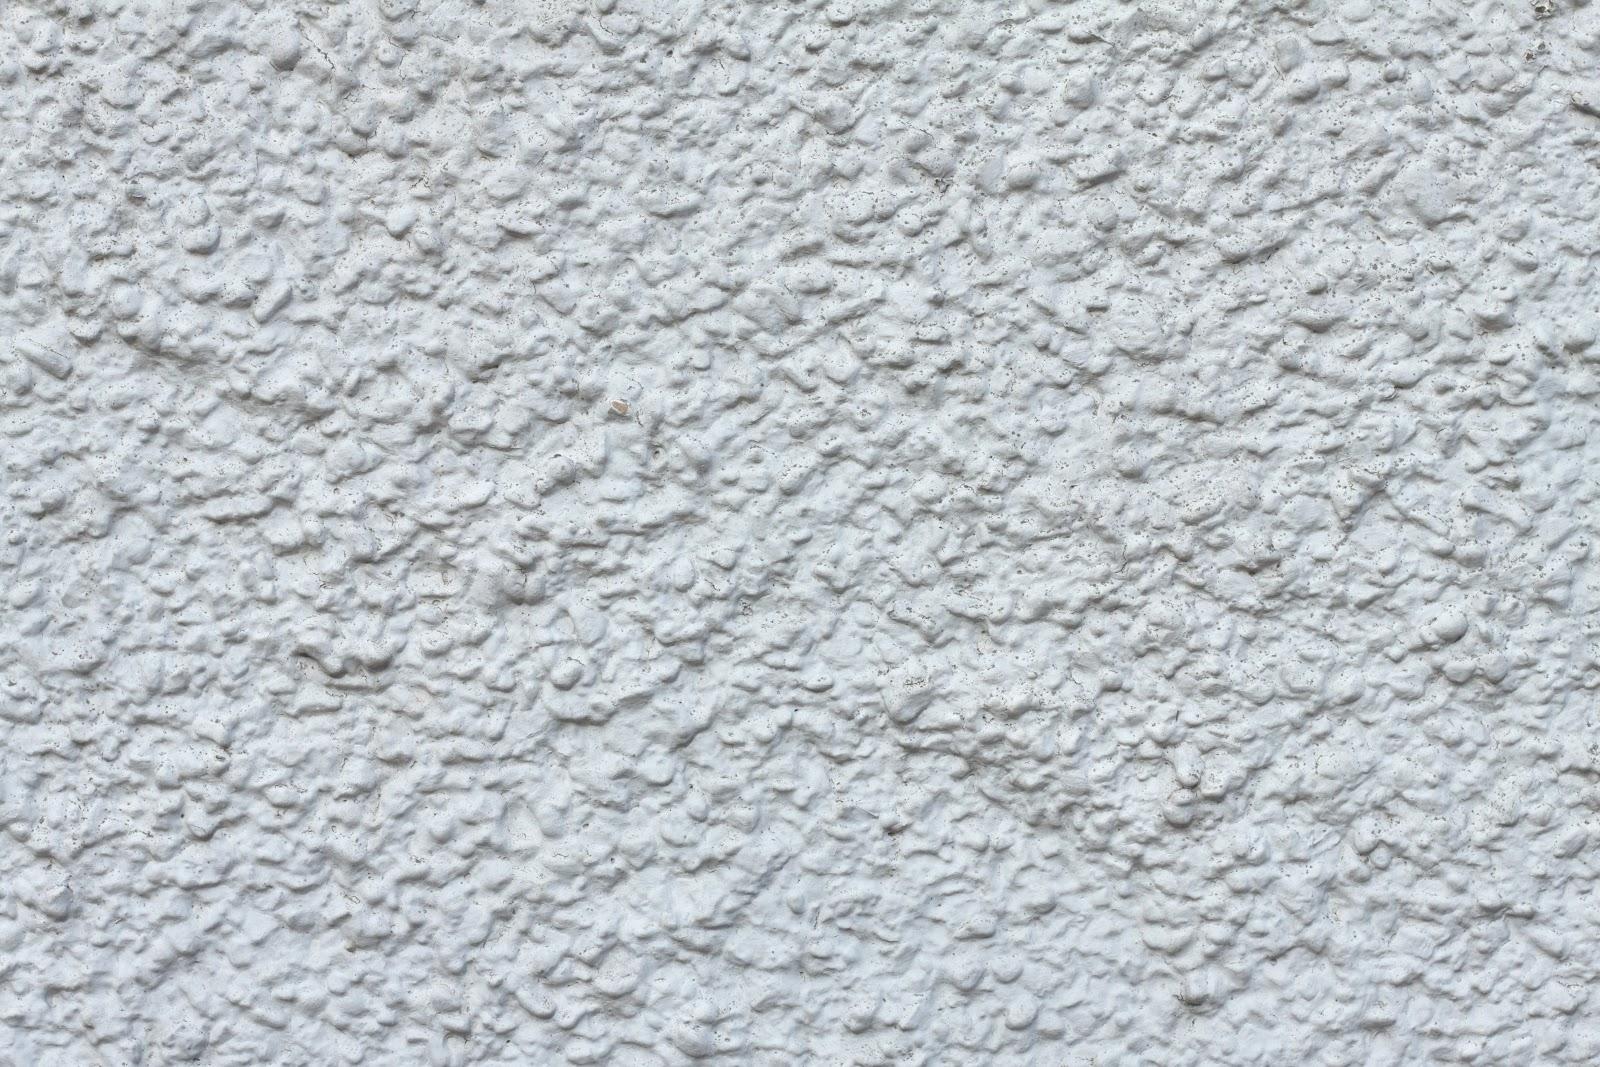 Lumpy plaster